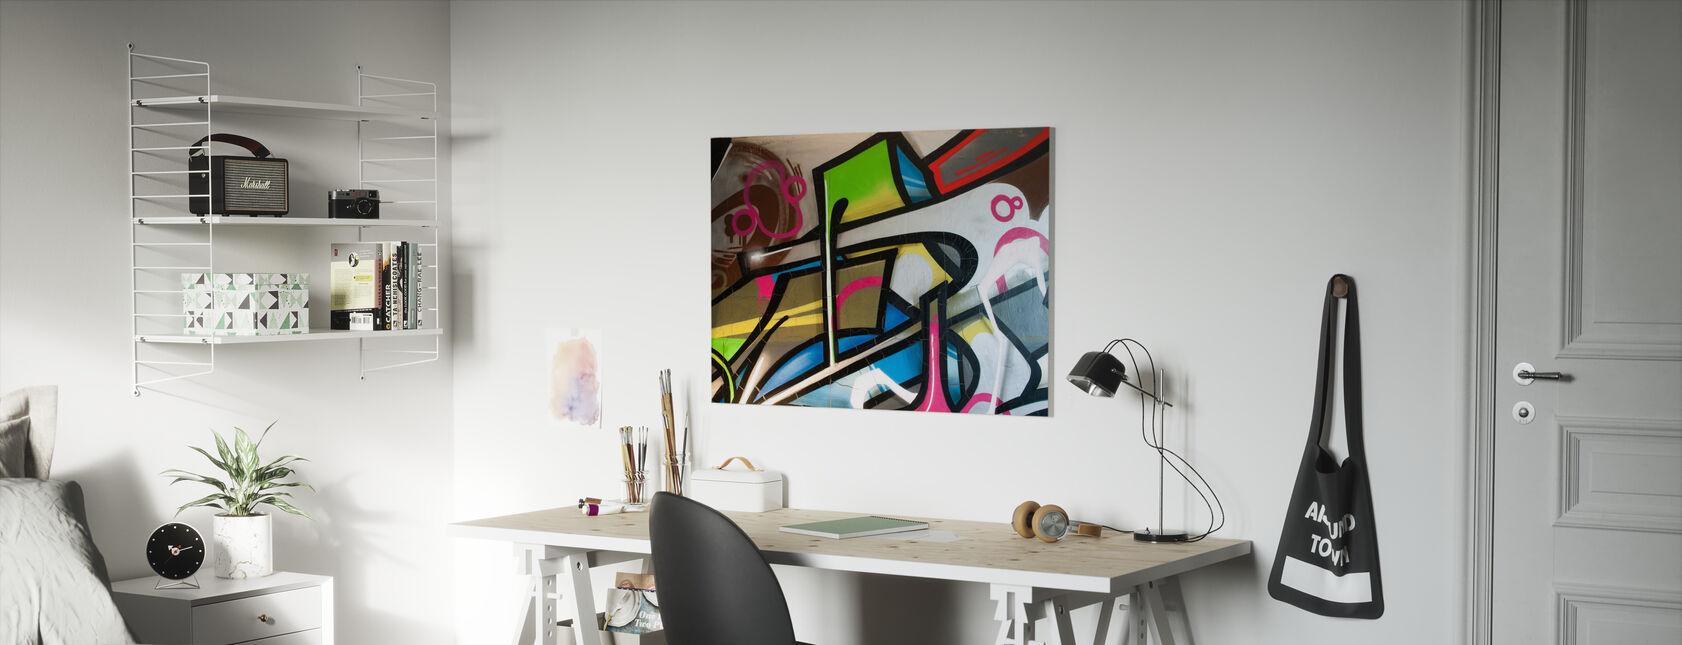 Colorful Graffiti - Canvas print - Kids Room